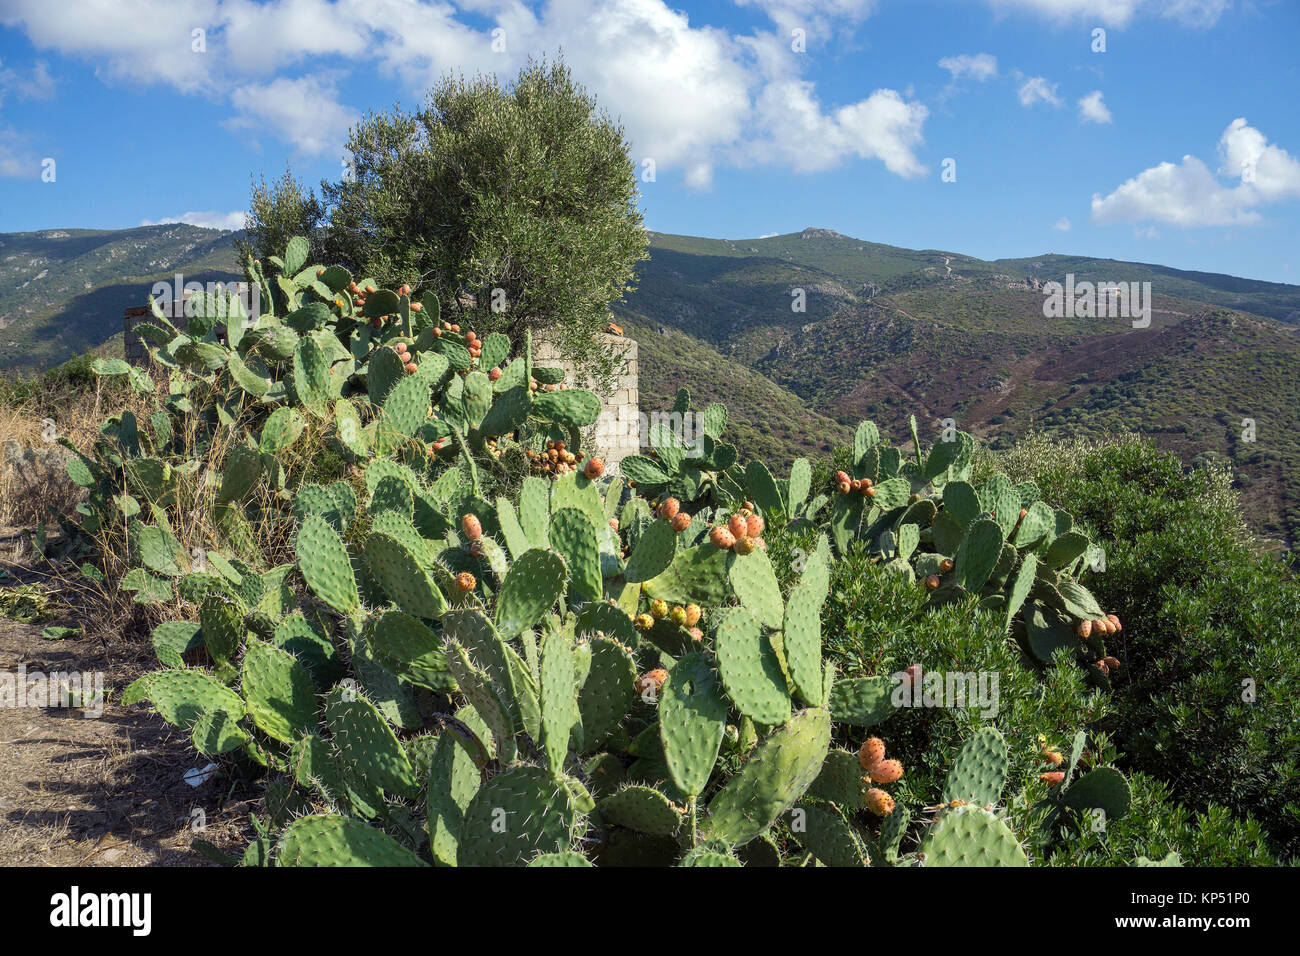 Prickly pears (Opuntia ficus-indica), Olbia-Tempio, Gallura, Sardinia, Italy, Mediterranean sea, Europe - Stock Image